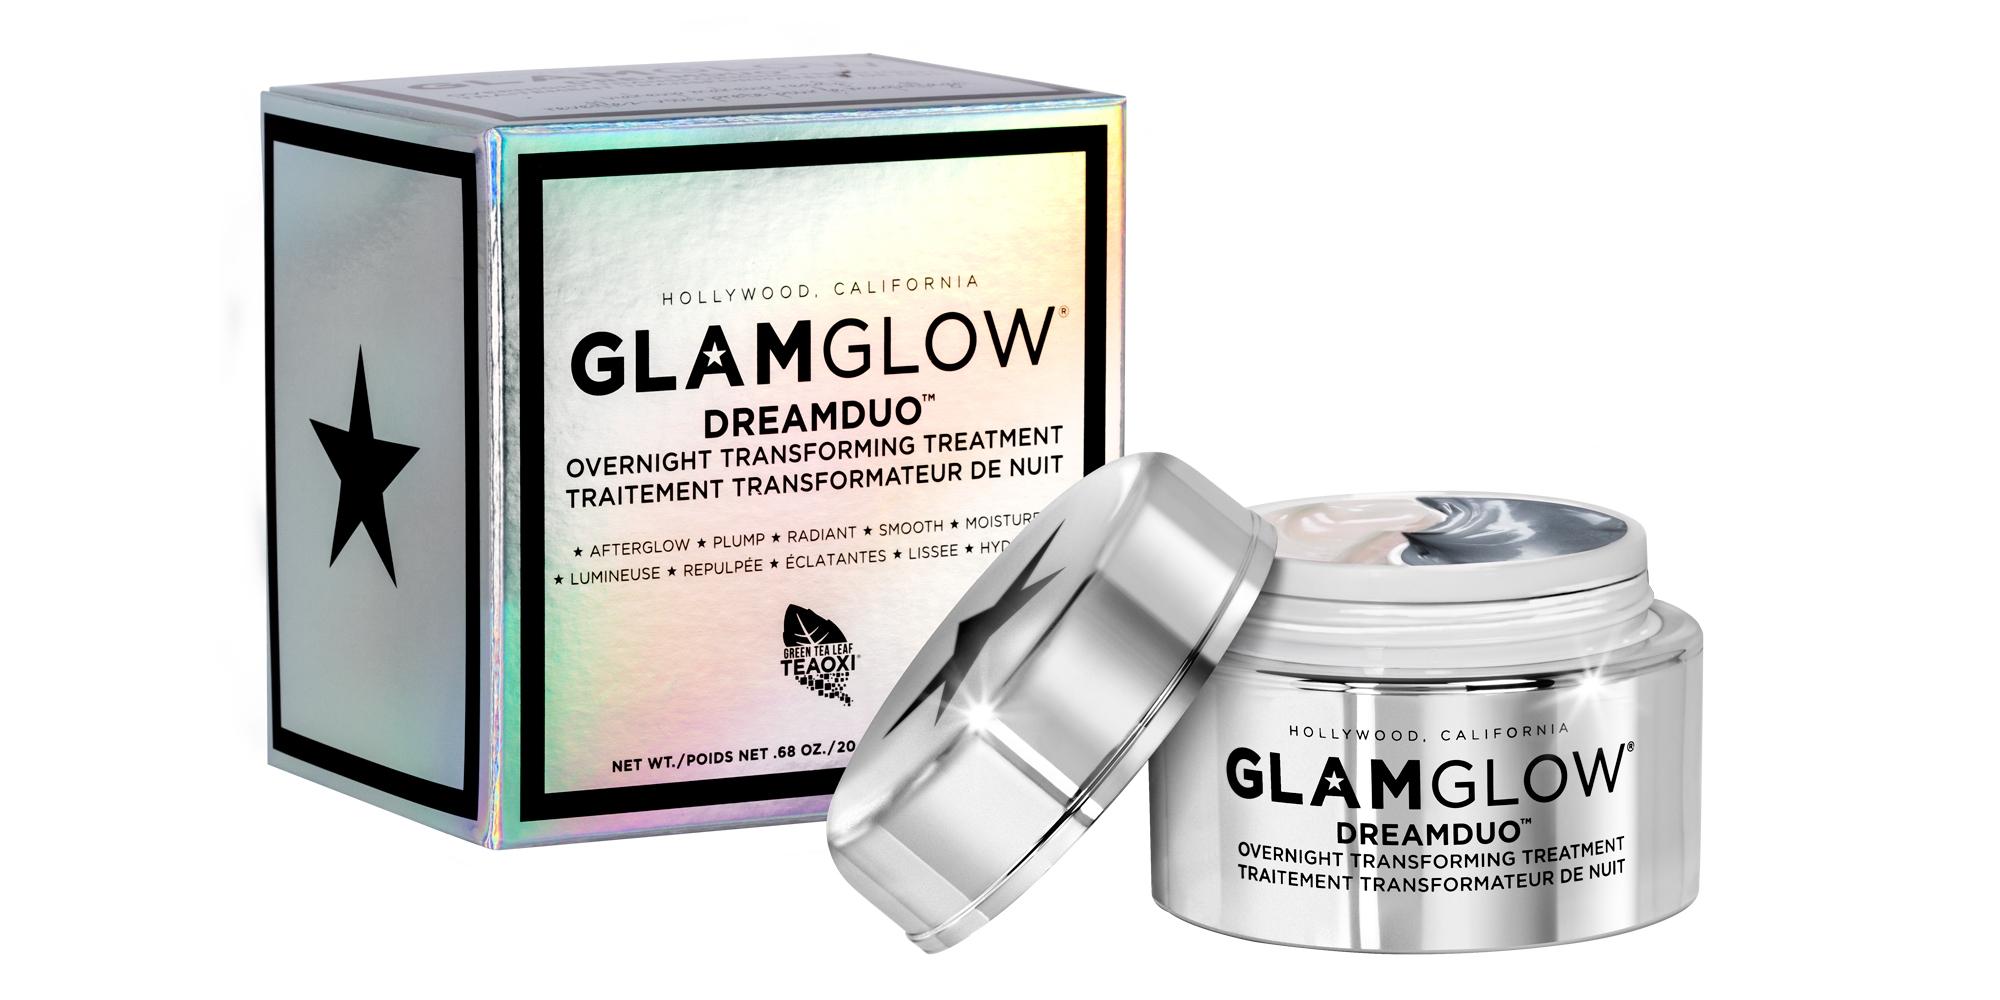 Glam Glow Dream Duo